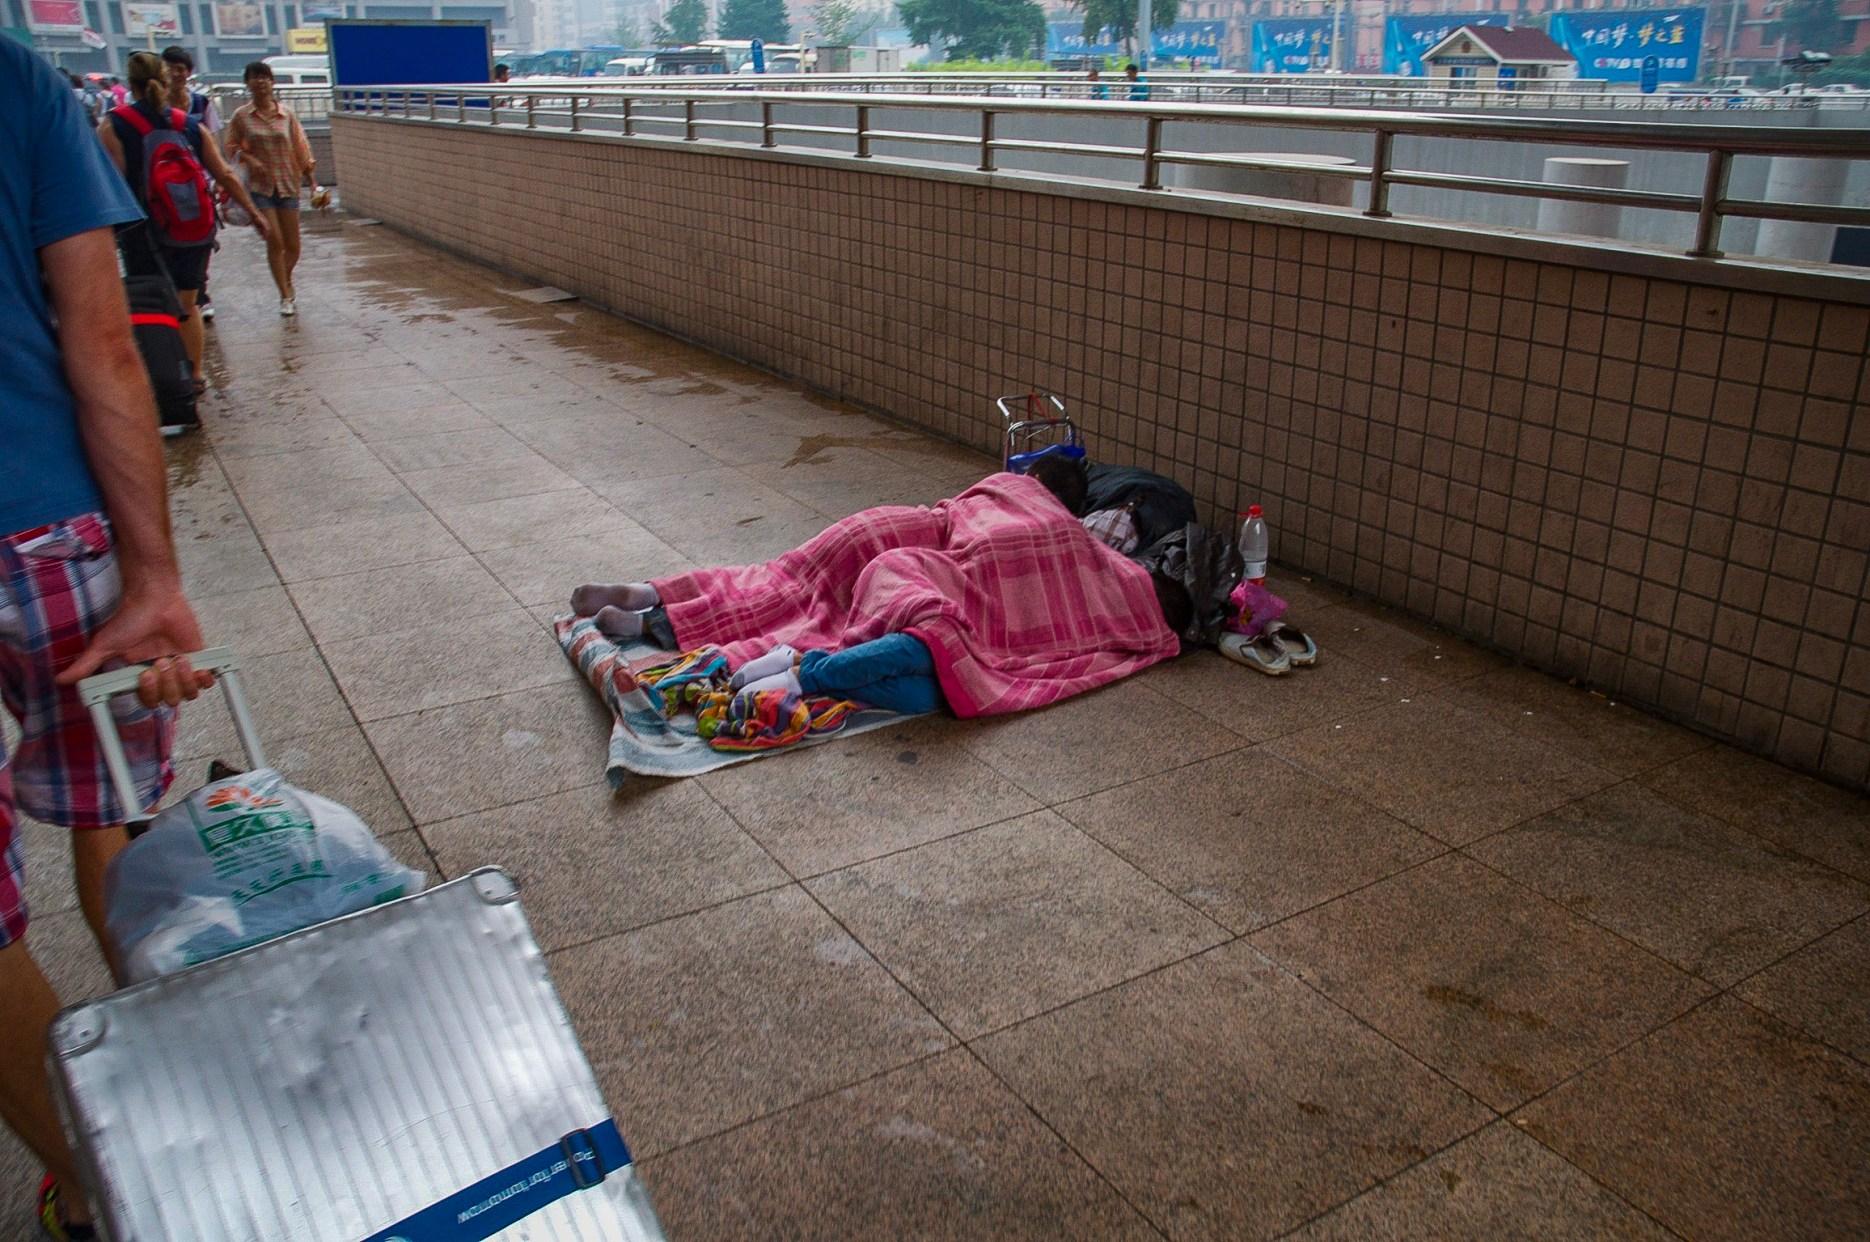 Warten auf den Zug, Pinyin Běijīng Zhàn (Hauptbahnhof) Peking (August 2013)